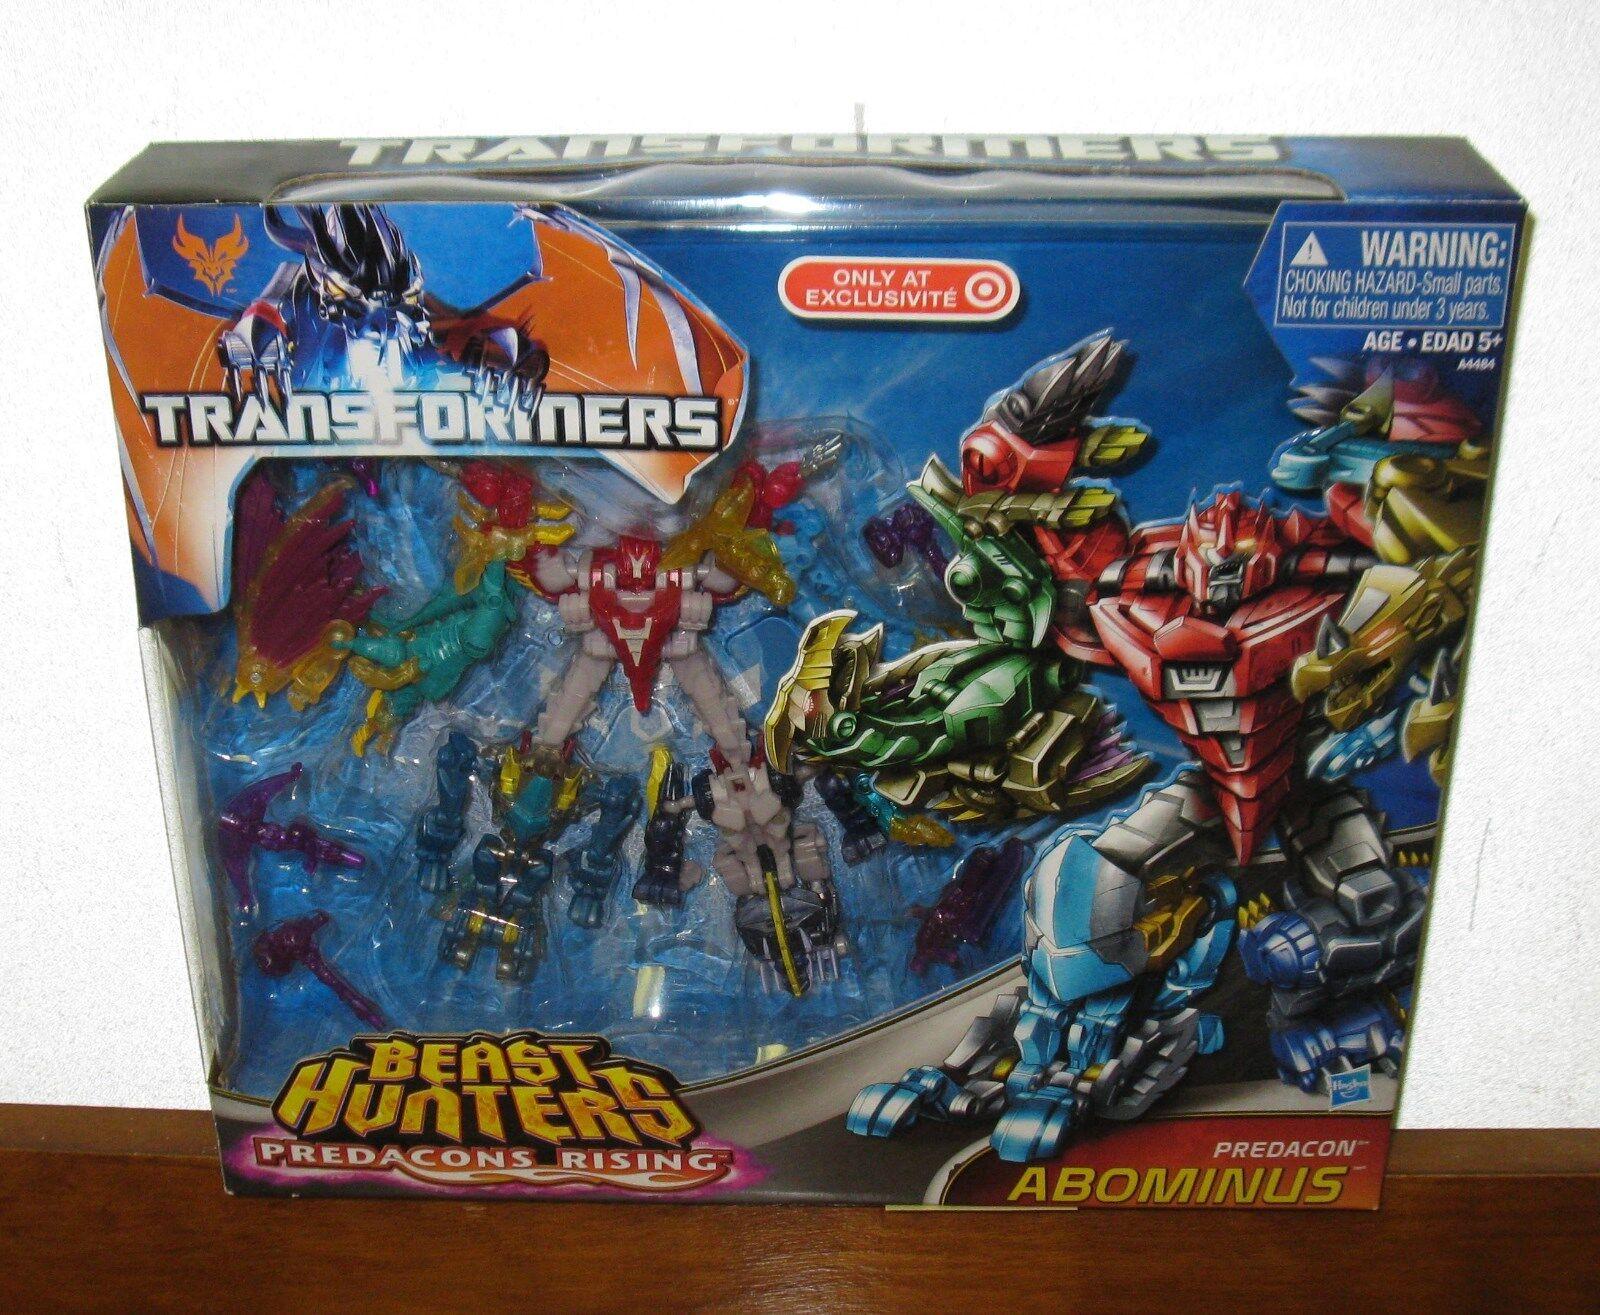 Transformers Beast Hunters Predacons Rising Abominus MB FREE SHIPPING